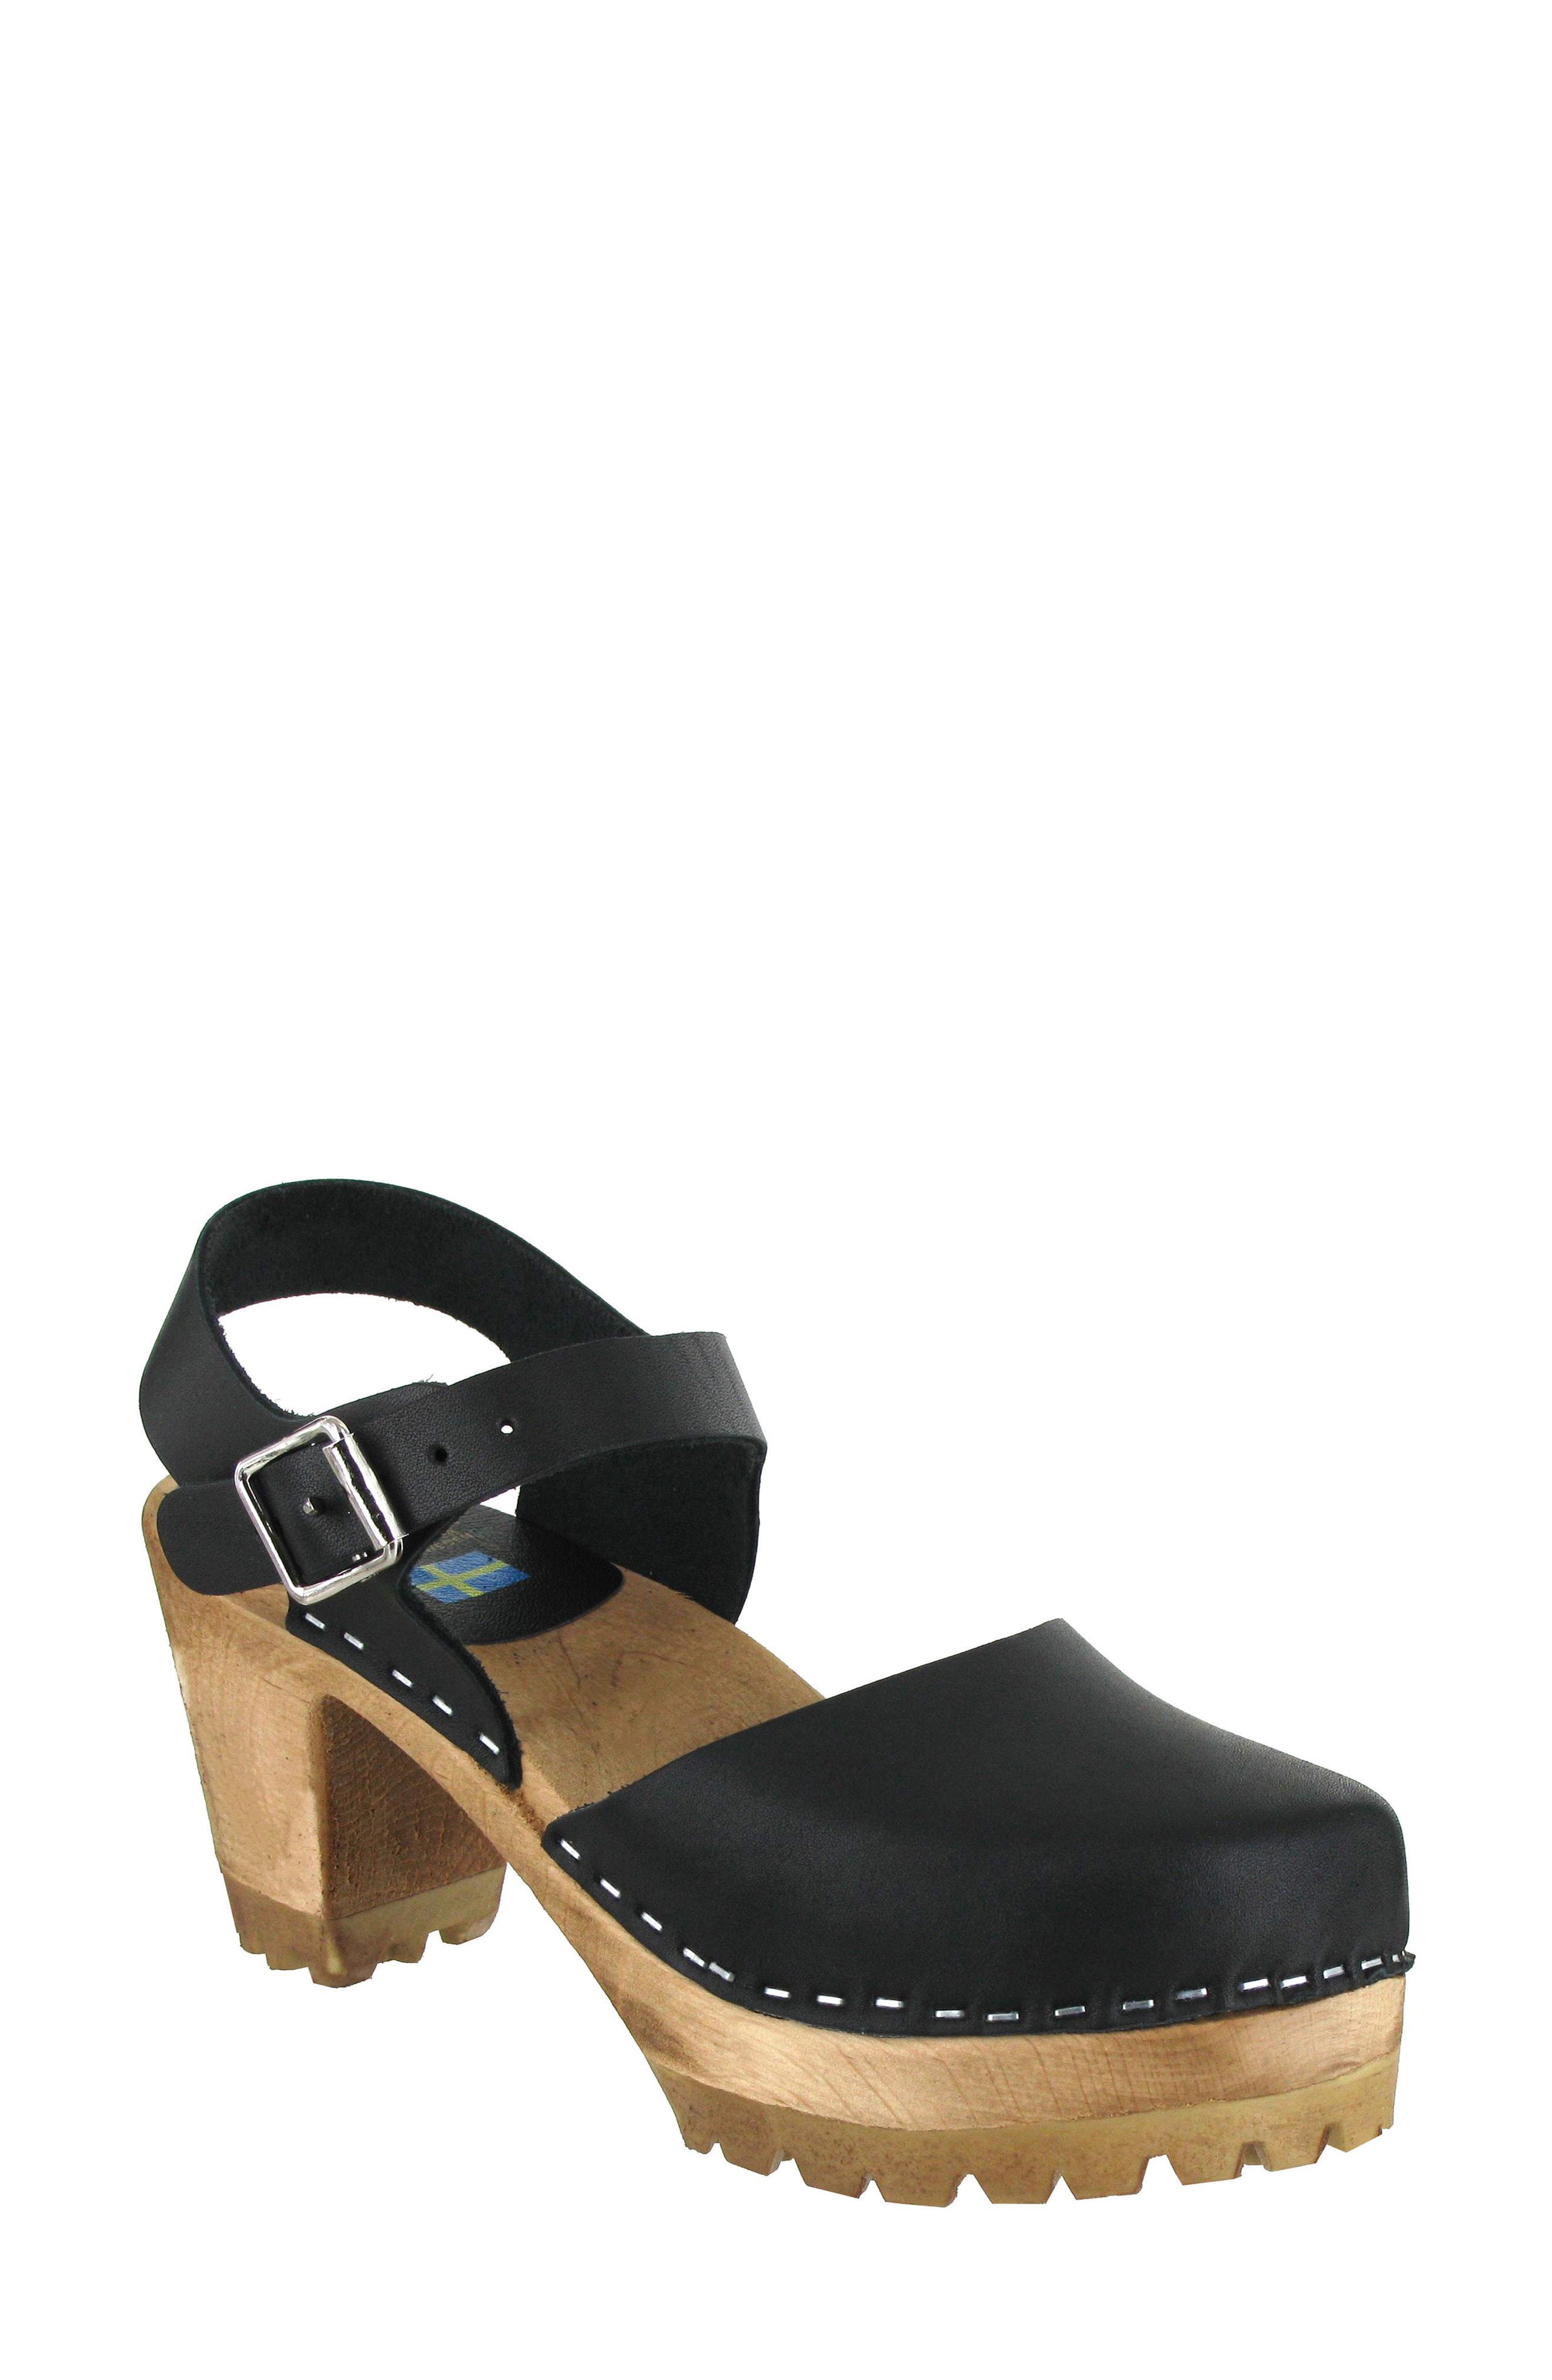 29b9181ae621 Lyst - MIA Abba Sandal in Black - Save 1%